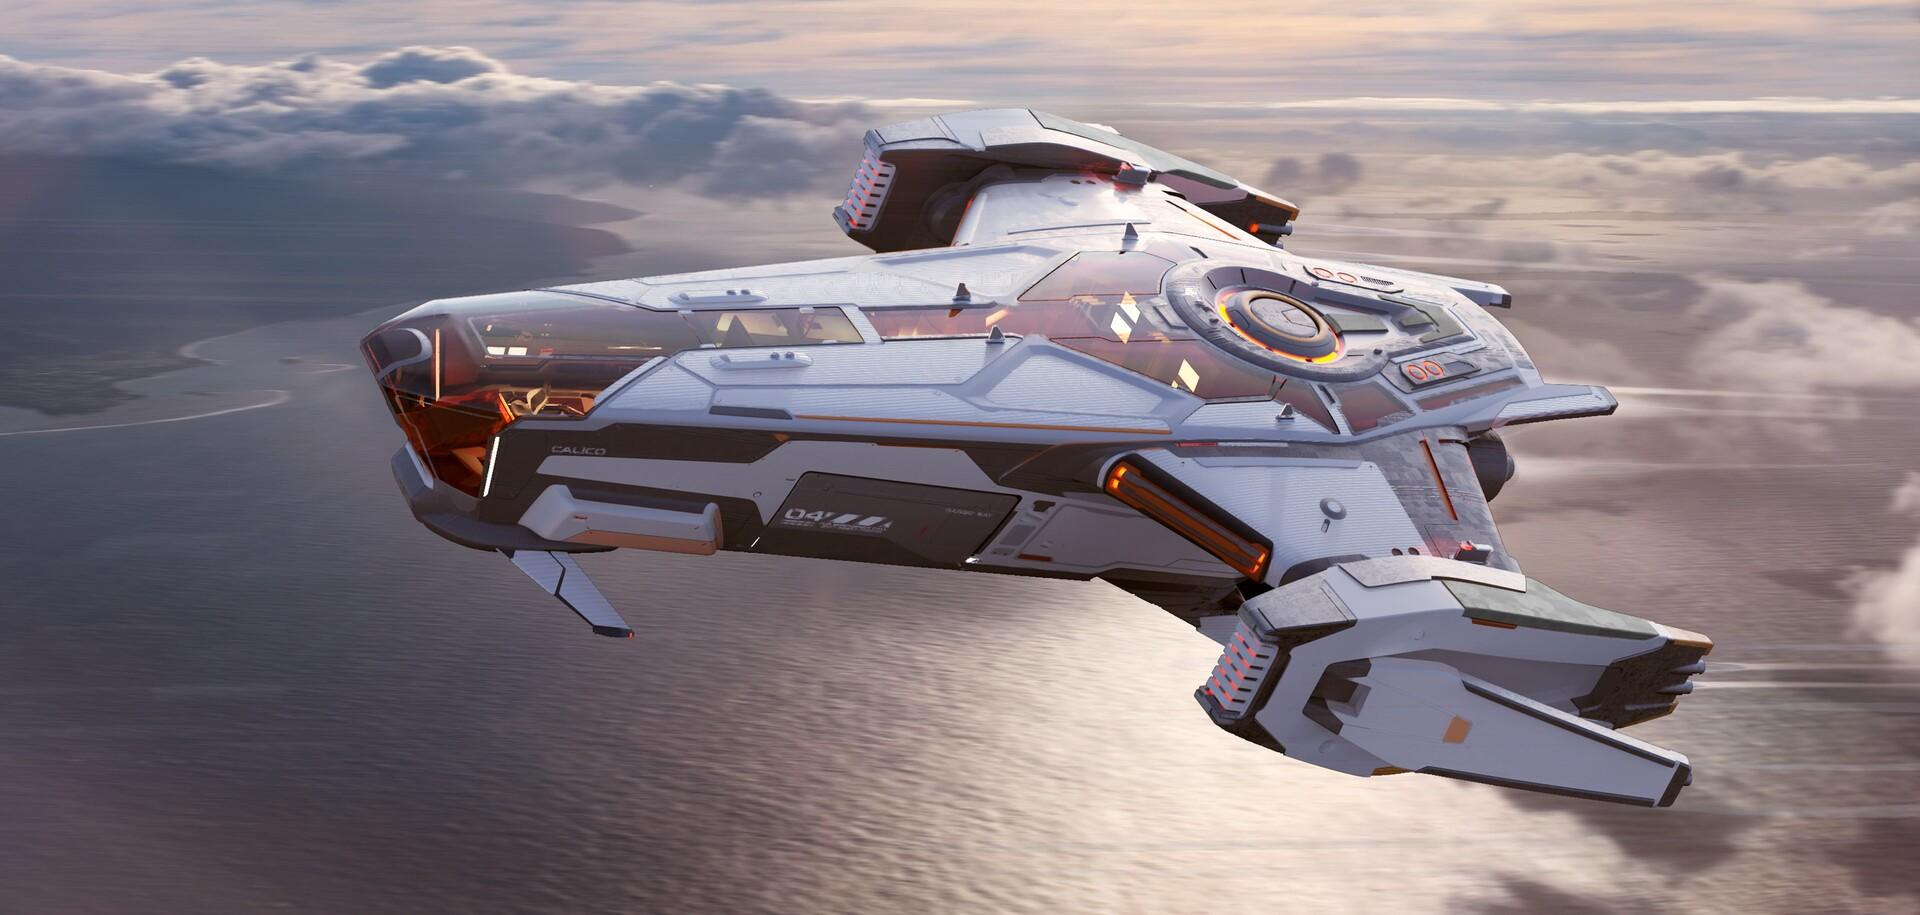 The Sleek Sci-Fi Designs of Andrian Luchian